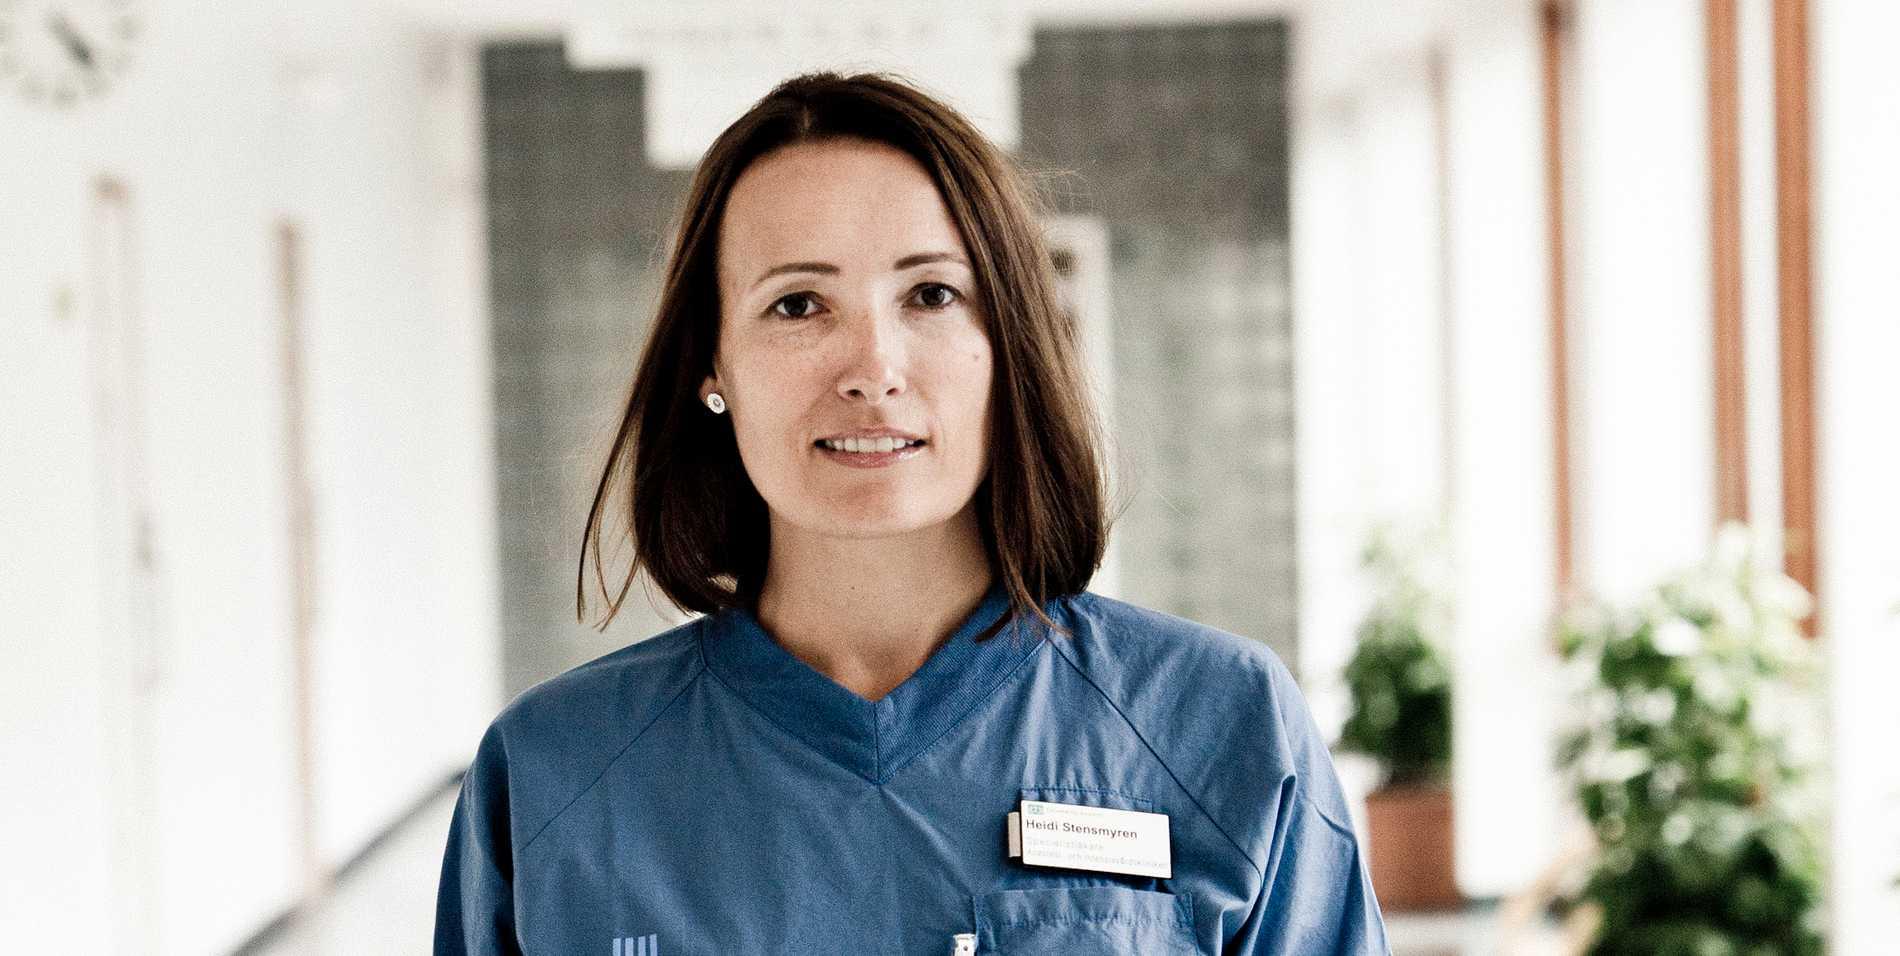 Heidi Stensmyren.